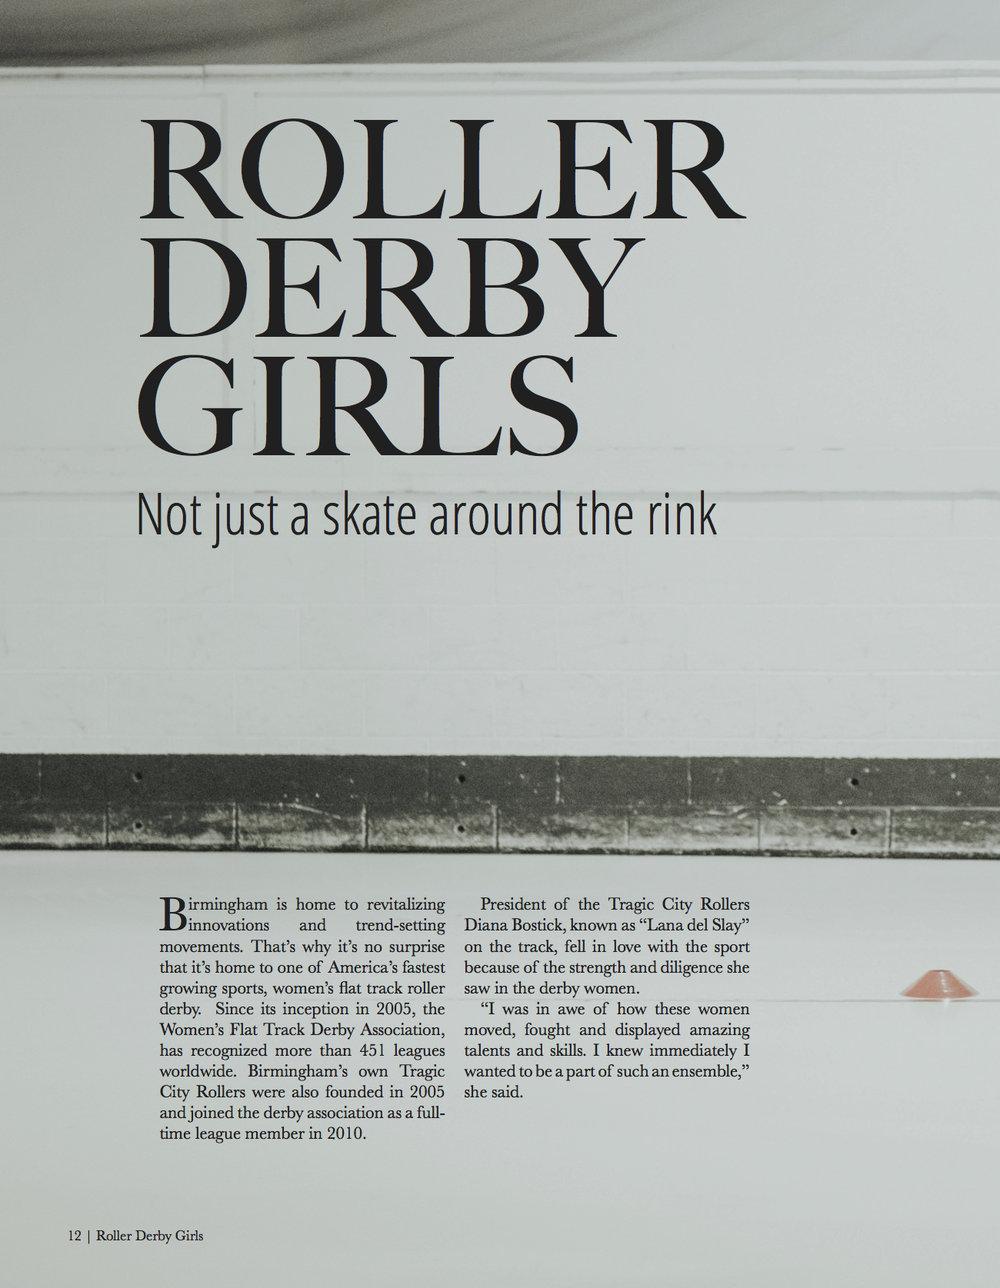 DONE RollerDerbyGirls.jpg